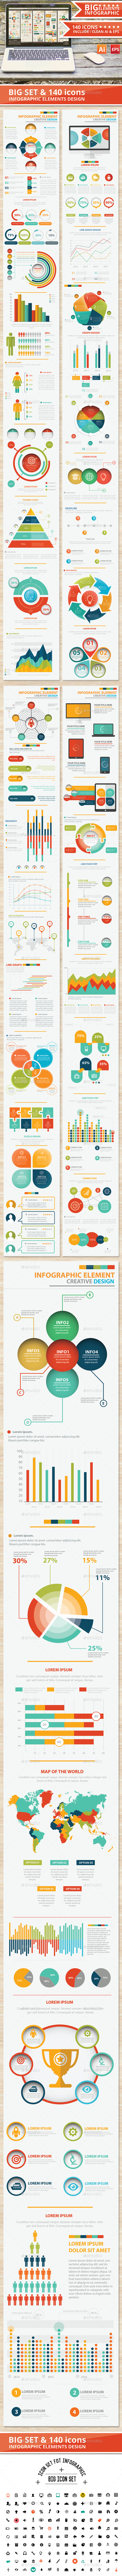 Big Infographic Elements Design Scheme V. 2 - Infographics